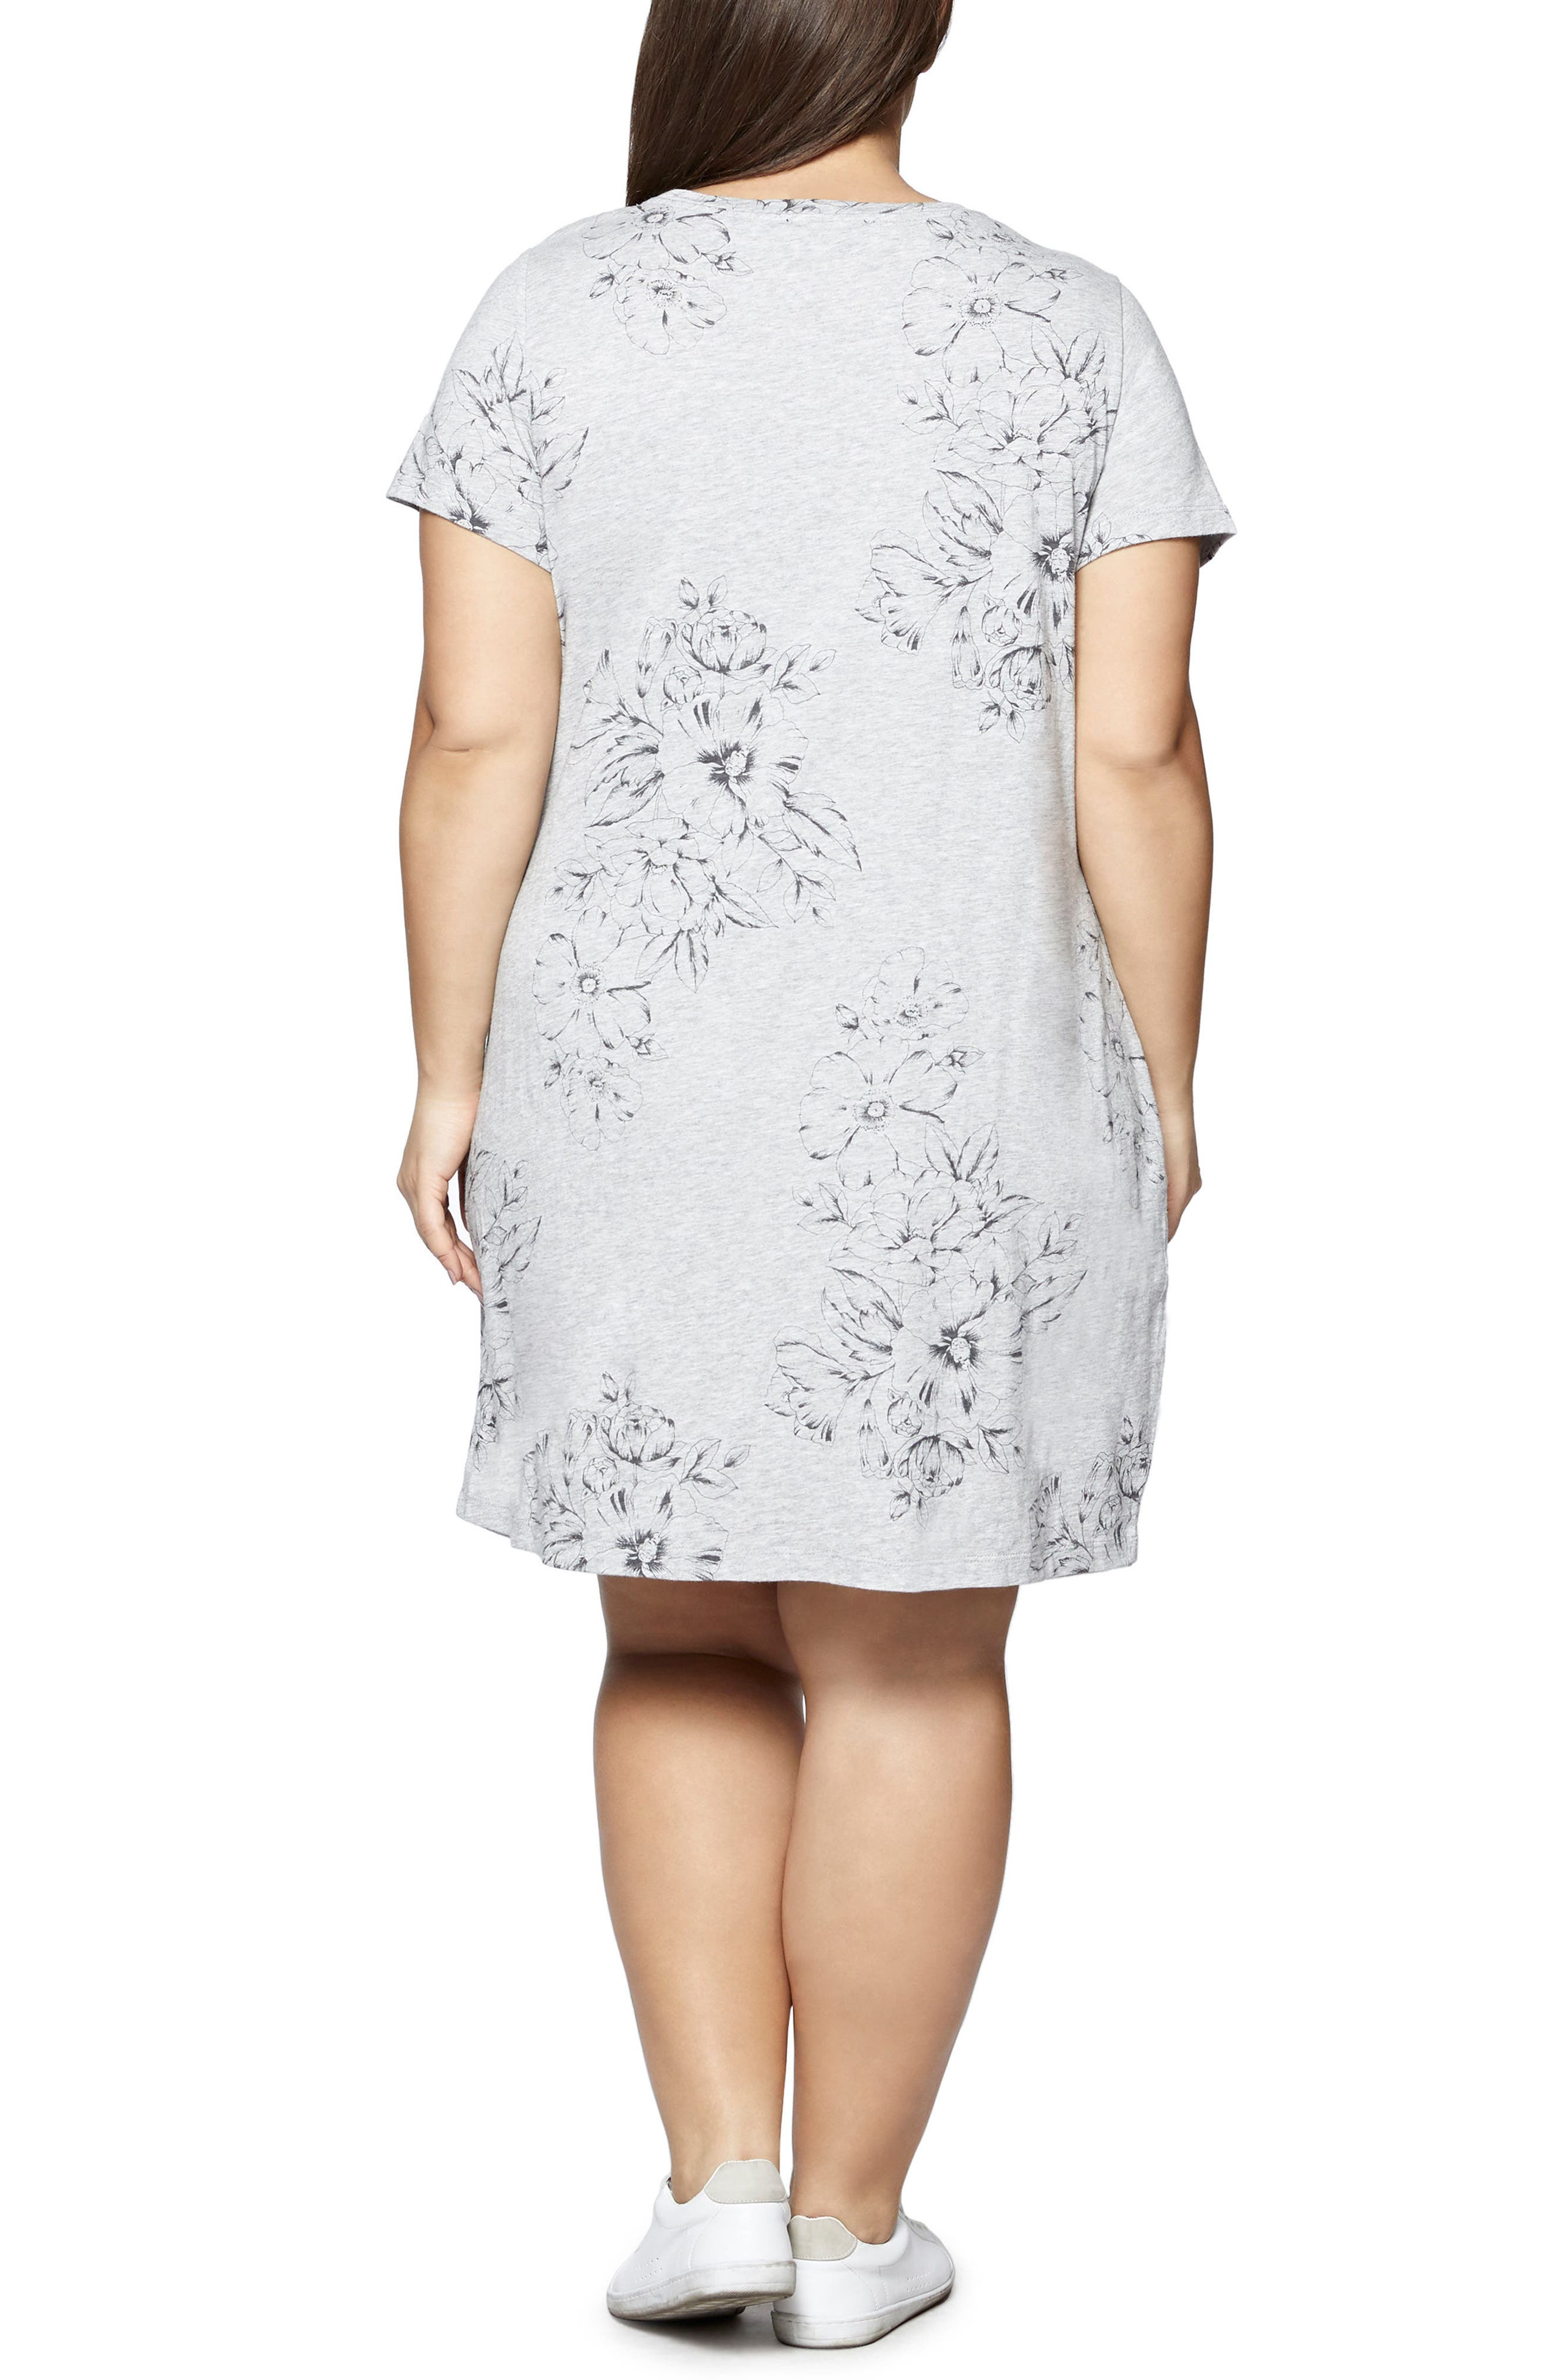 Wrapsody Print T-Shirt Dress,                             Alternate thumbnail 2, color,                             Heather Grey